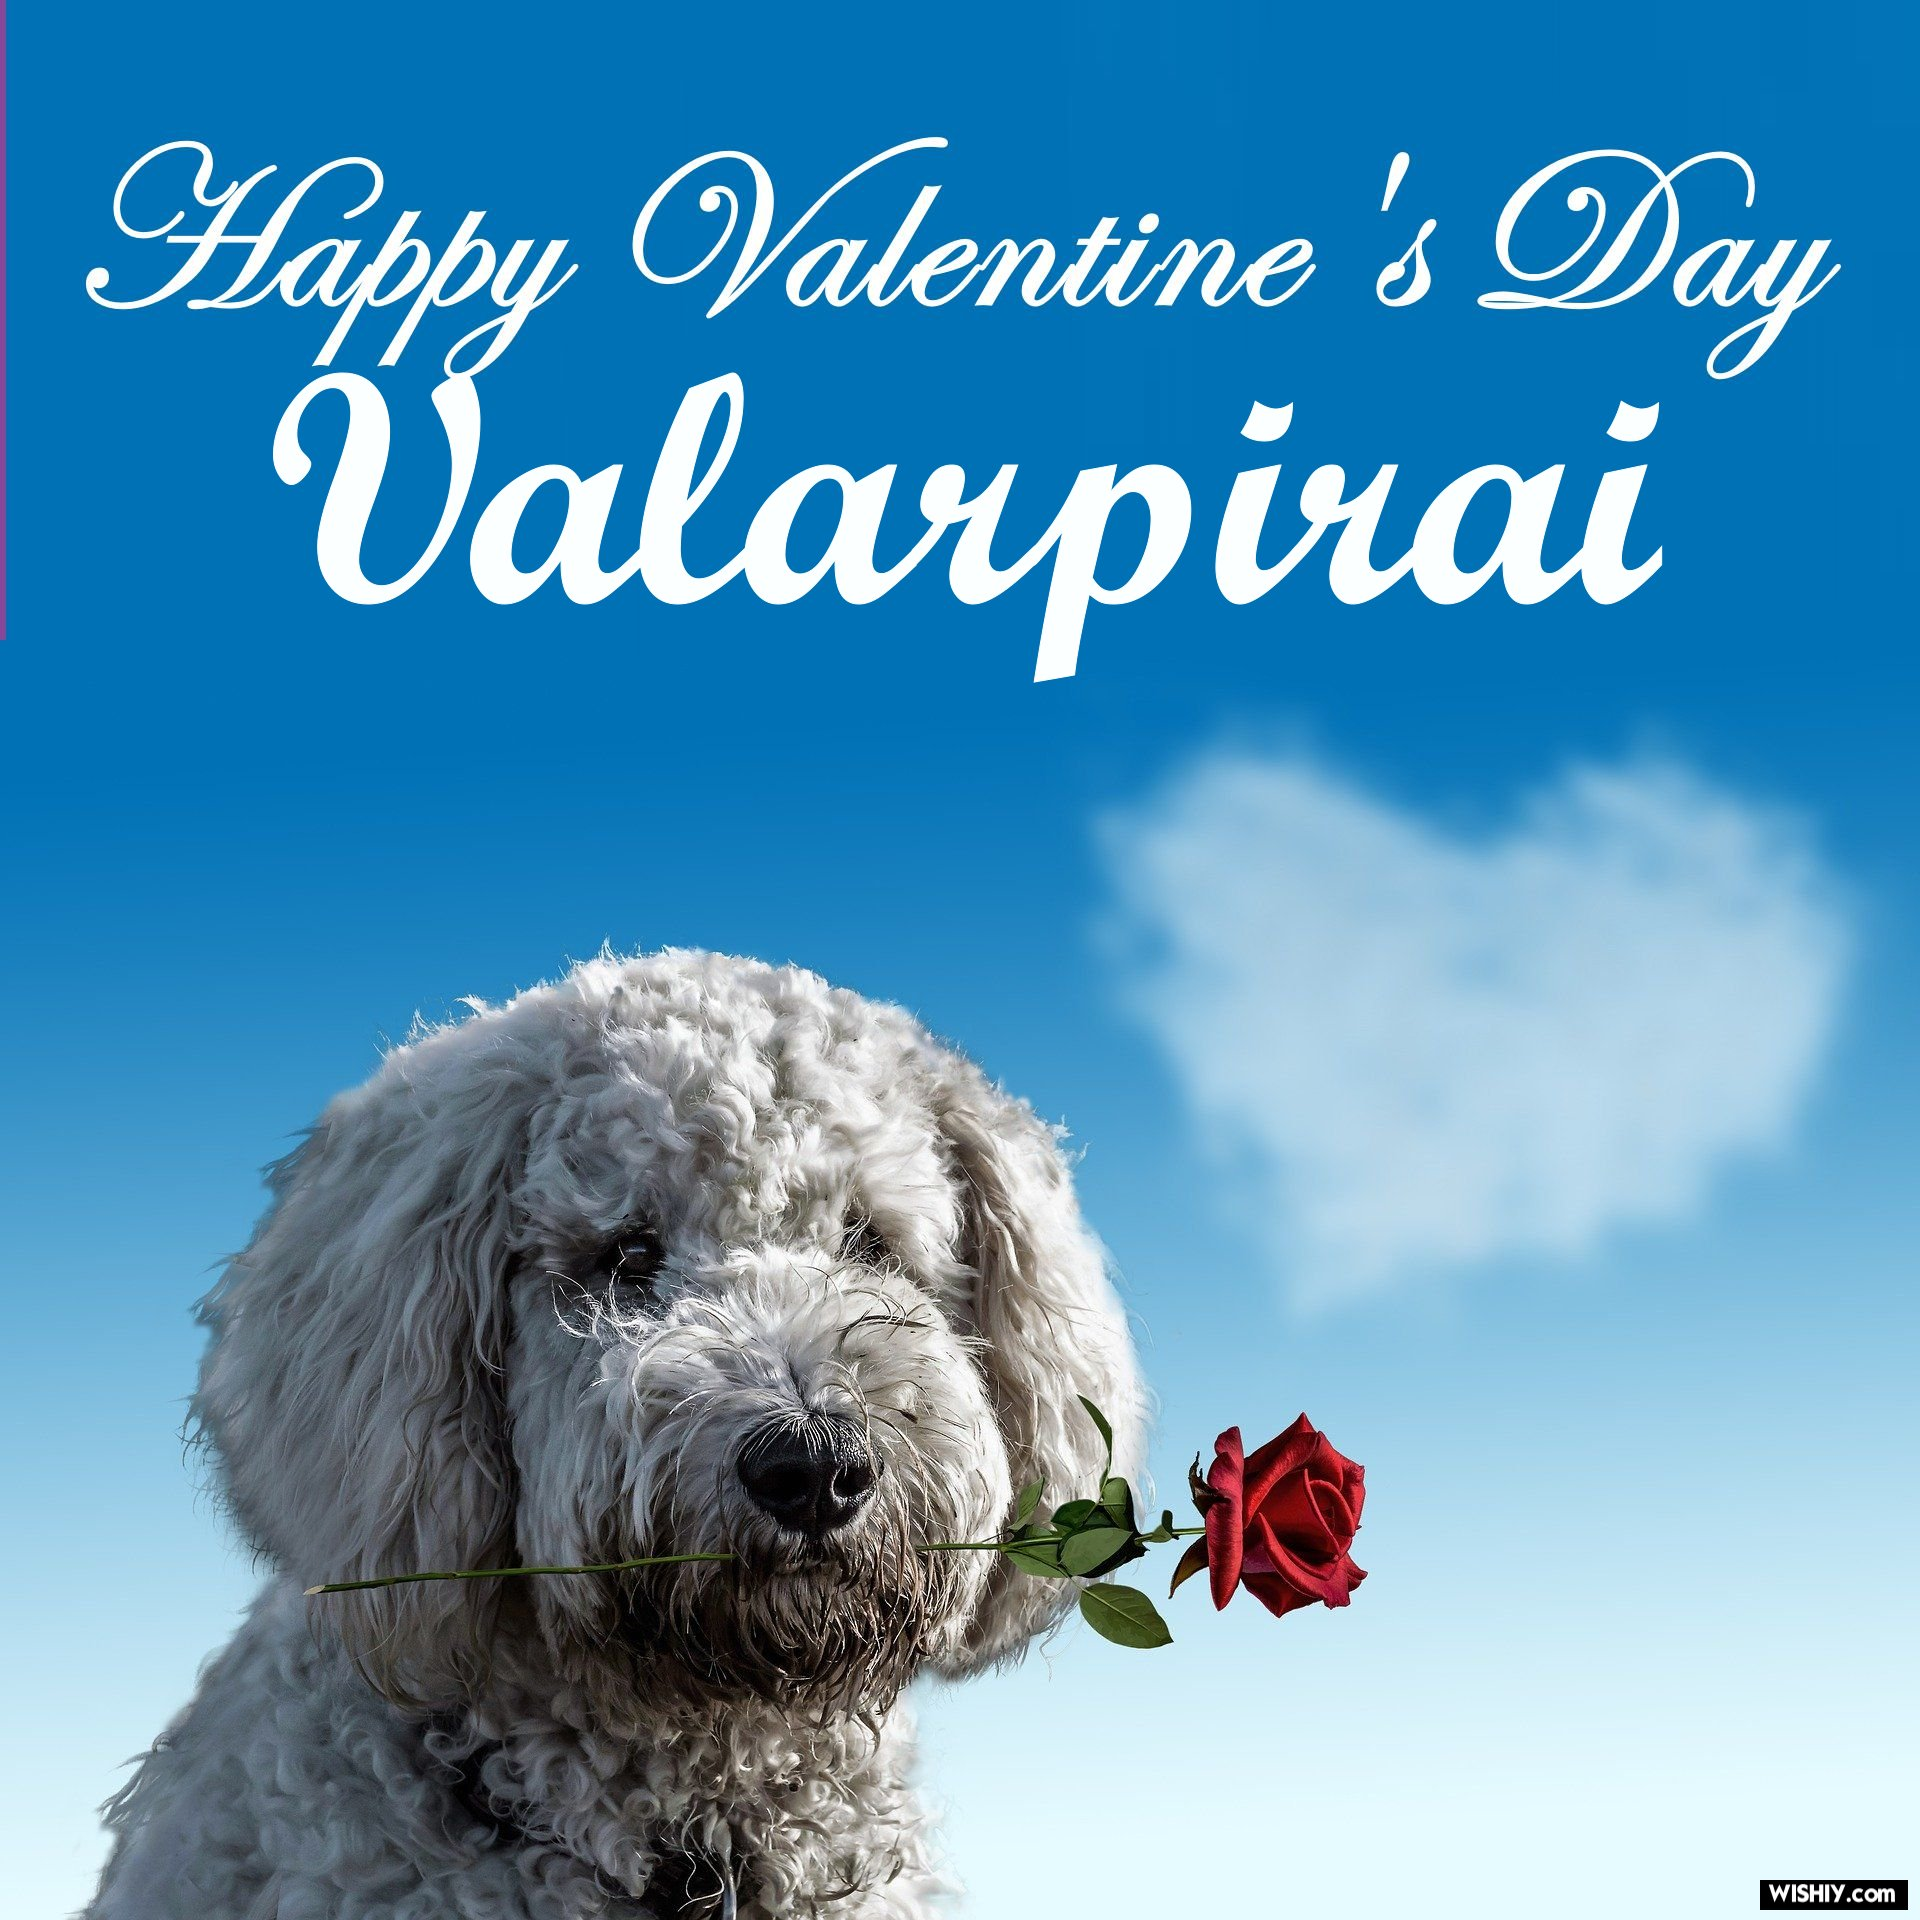 25 Best Love Images For Valarpirai Instant Download 2020